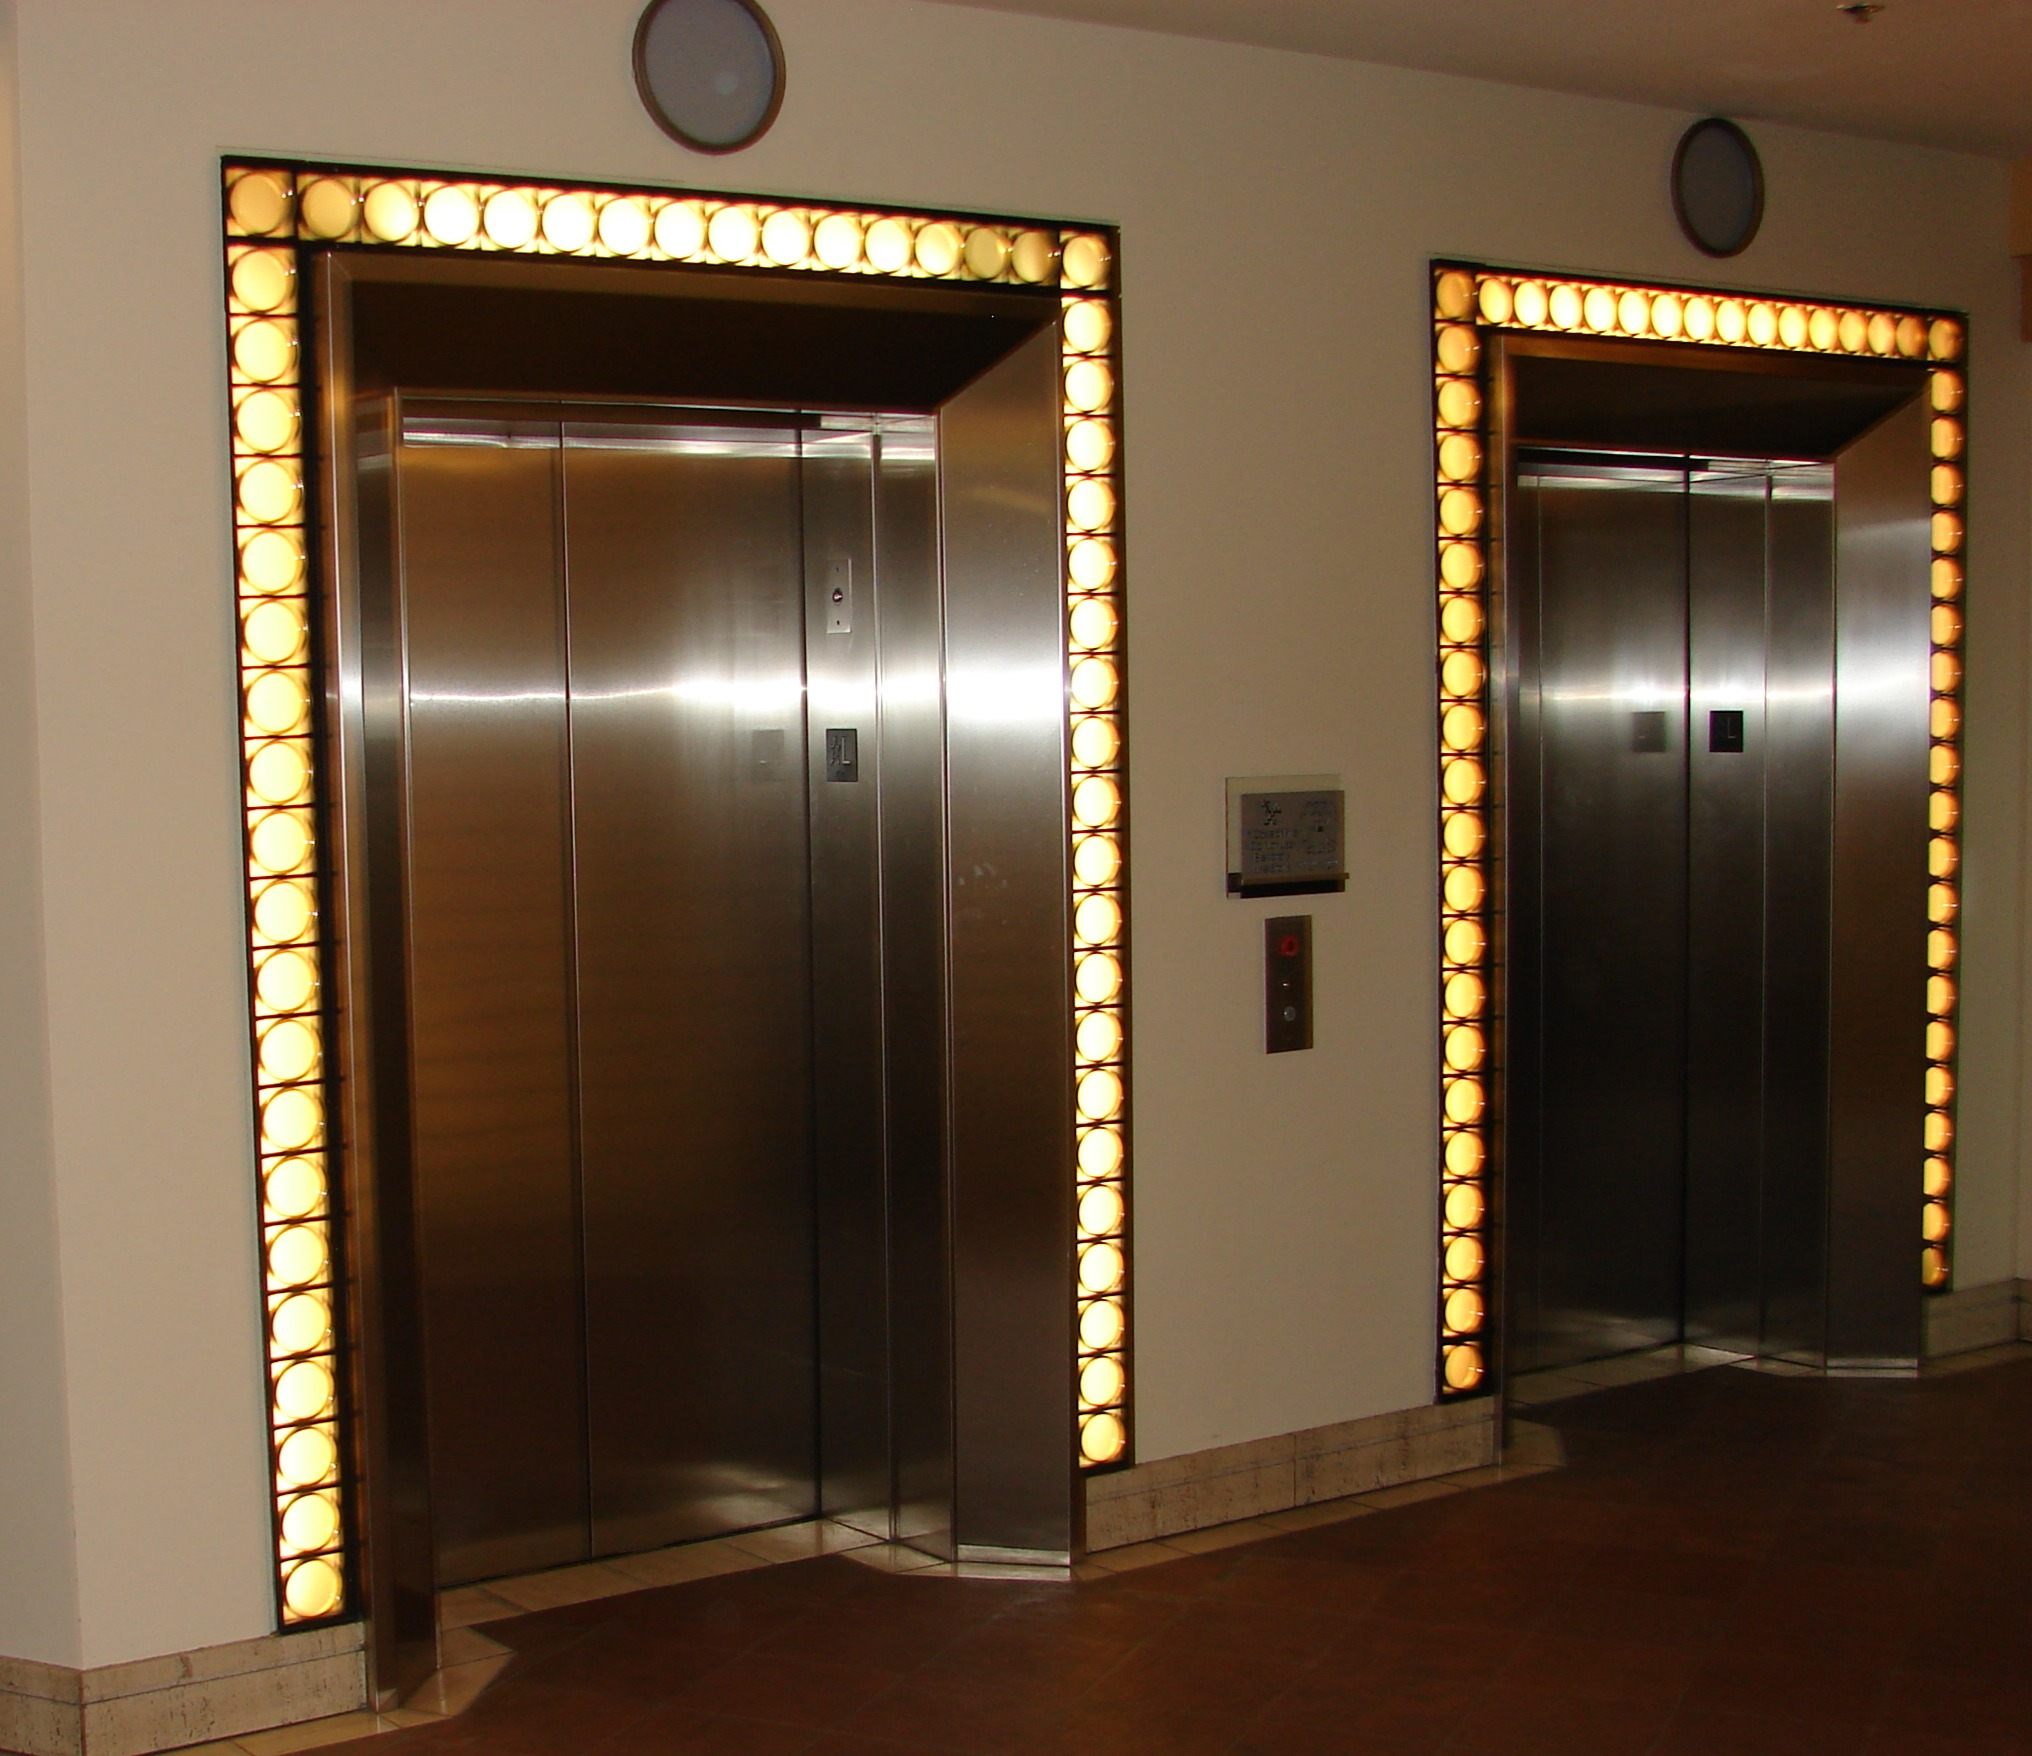 Stainless Steel Elevator Jambs